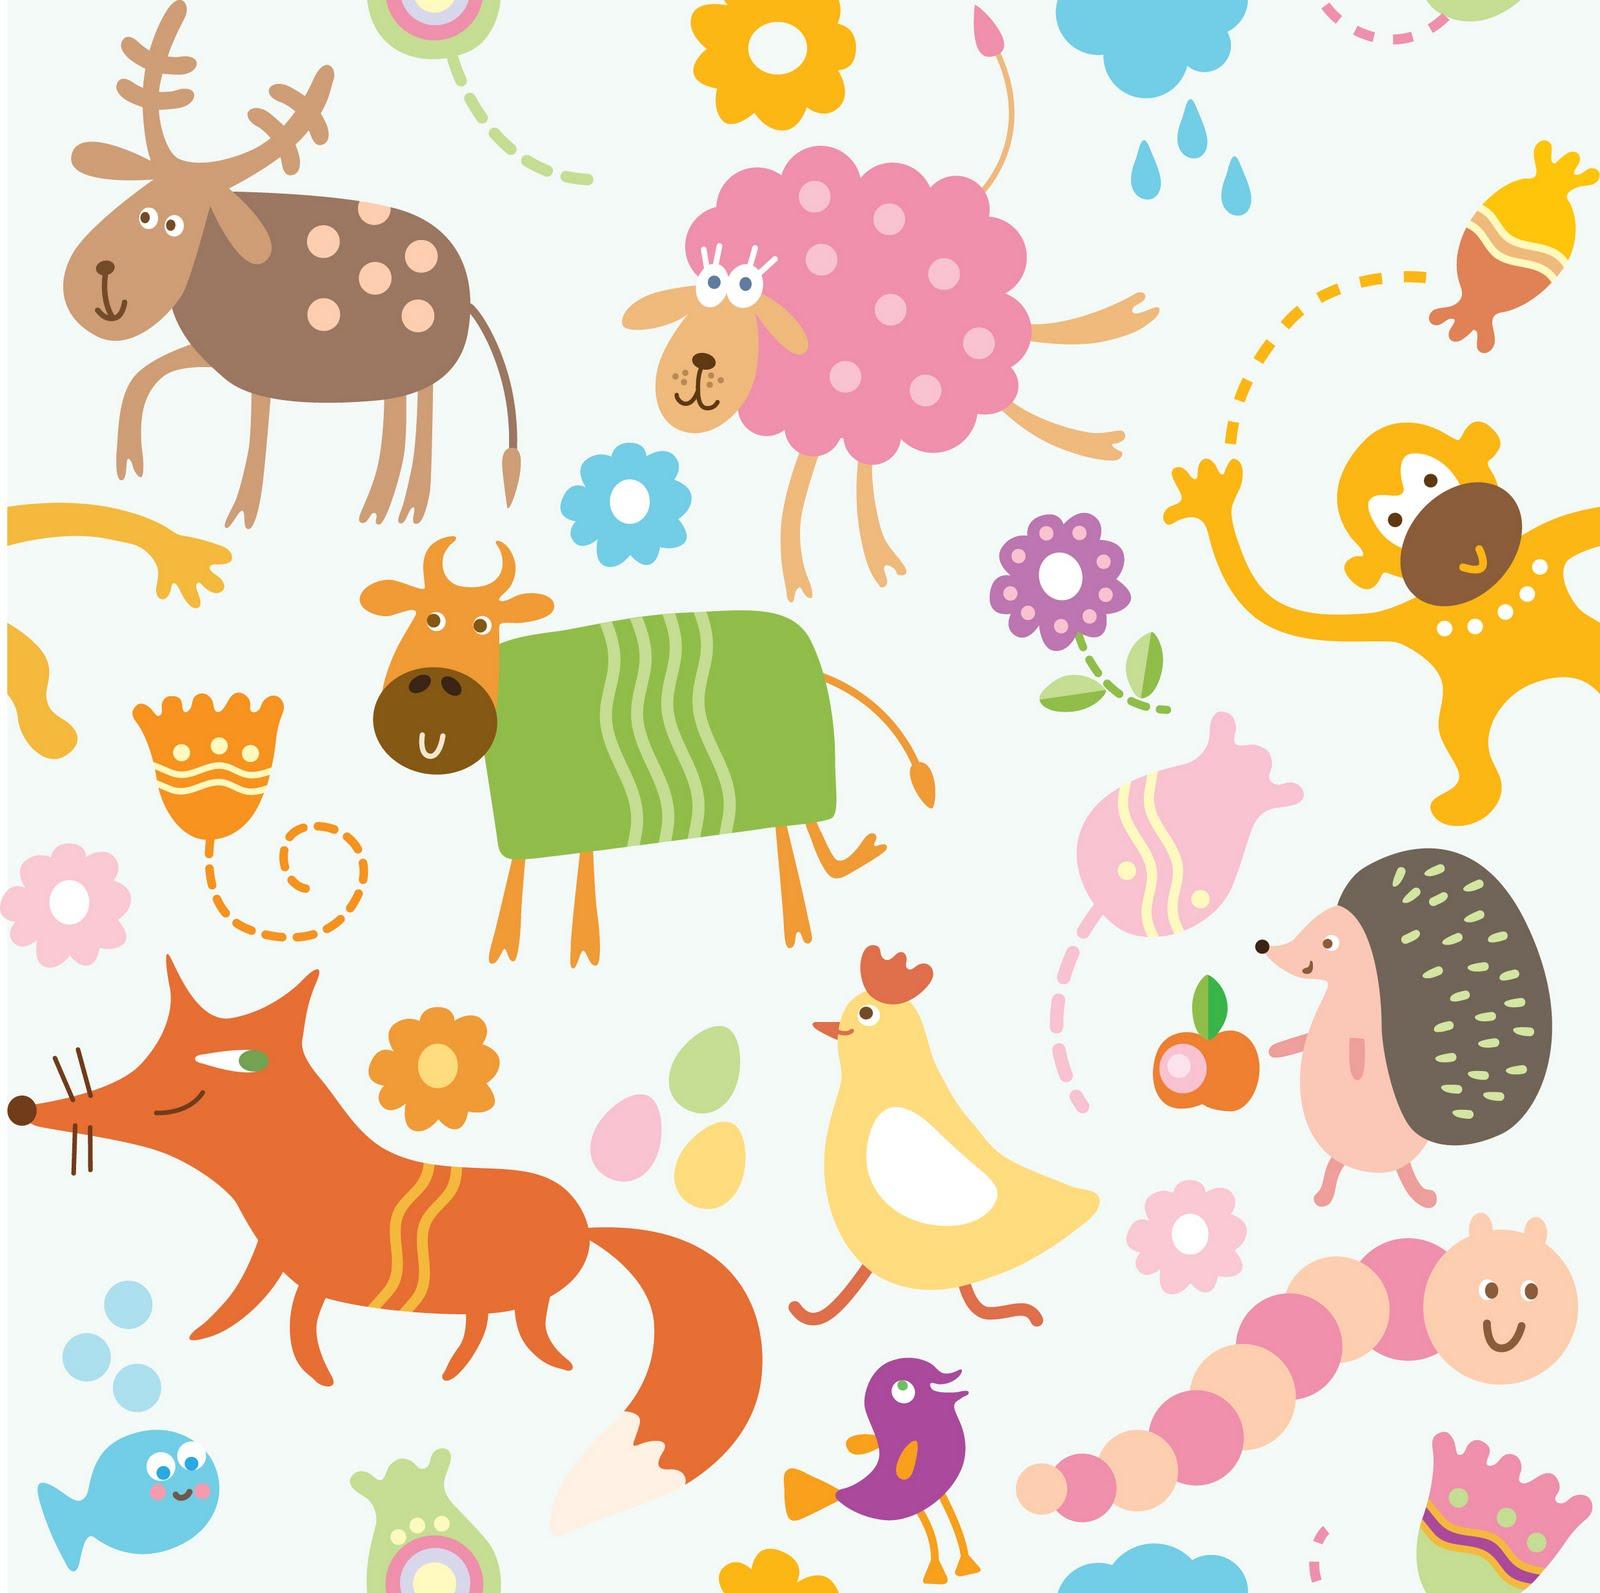 Fondos infantiles de animales